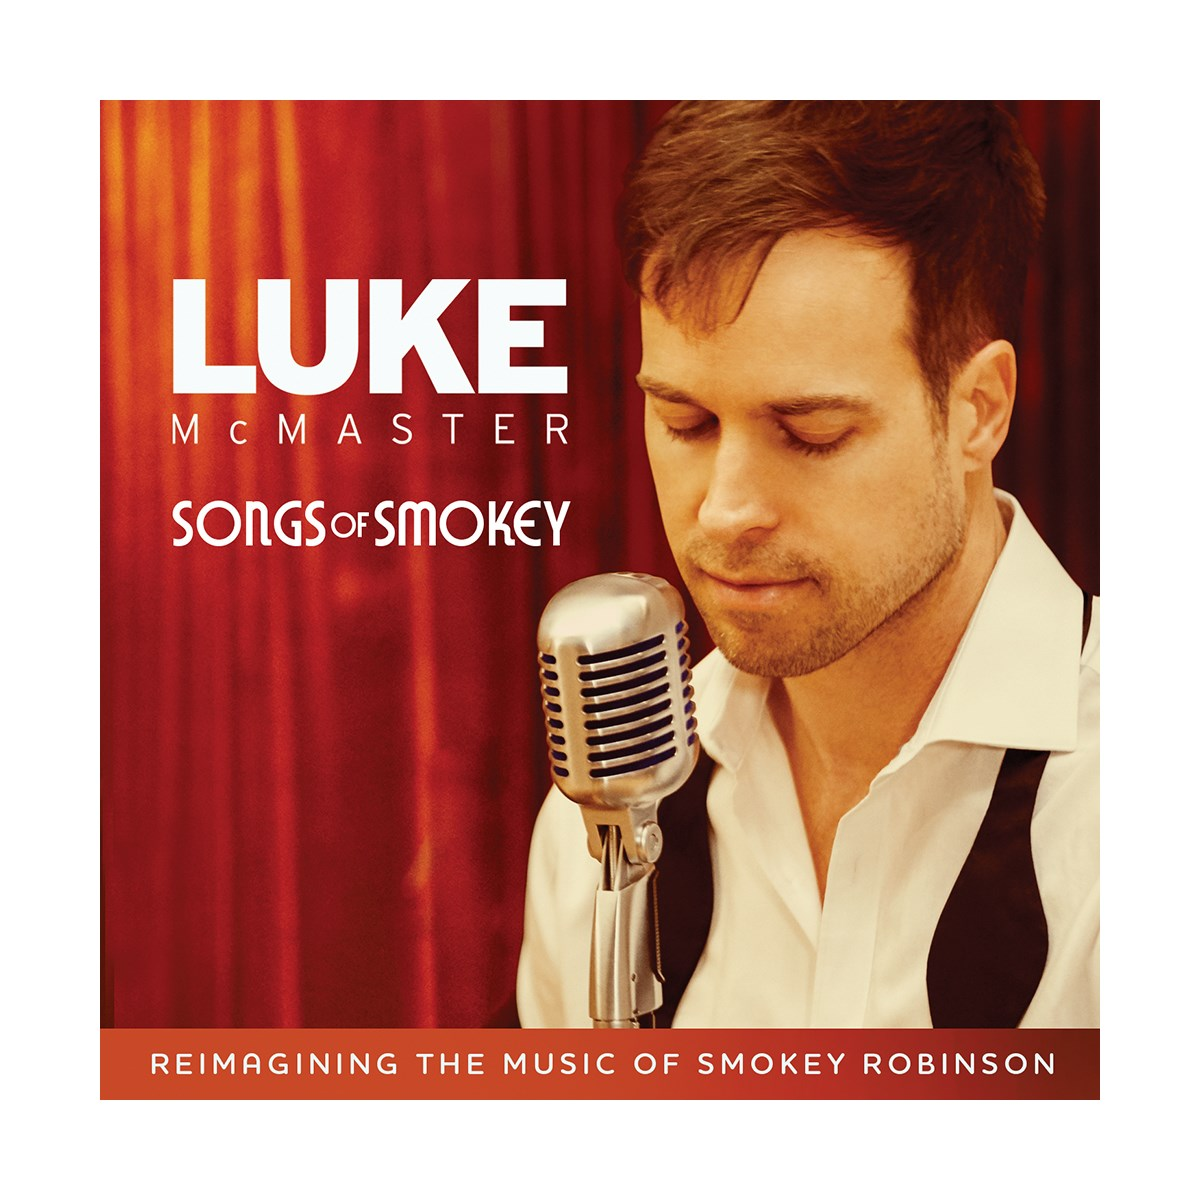 Songs of Smokey